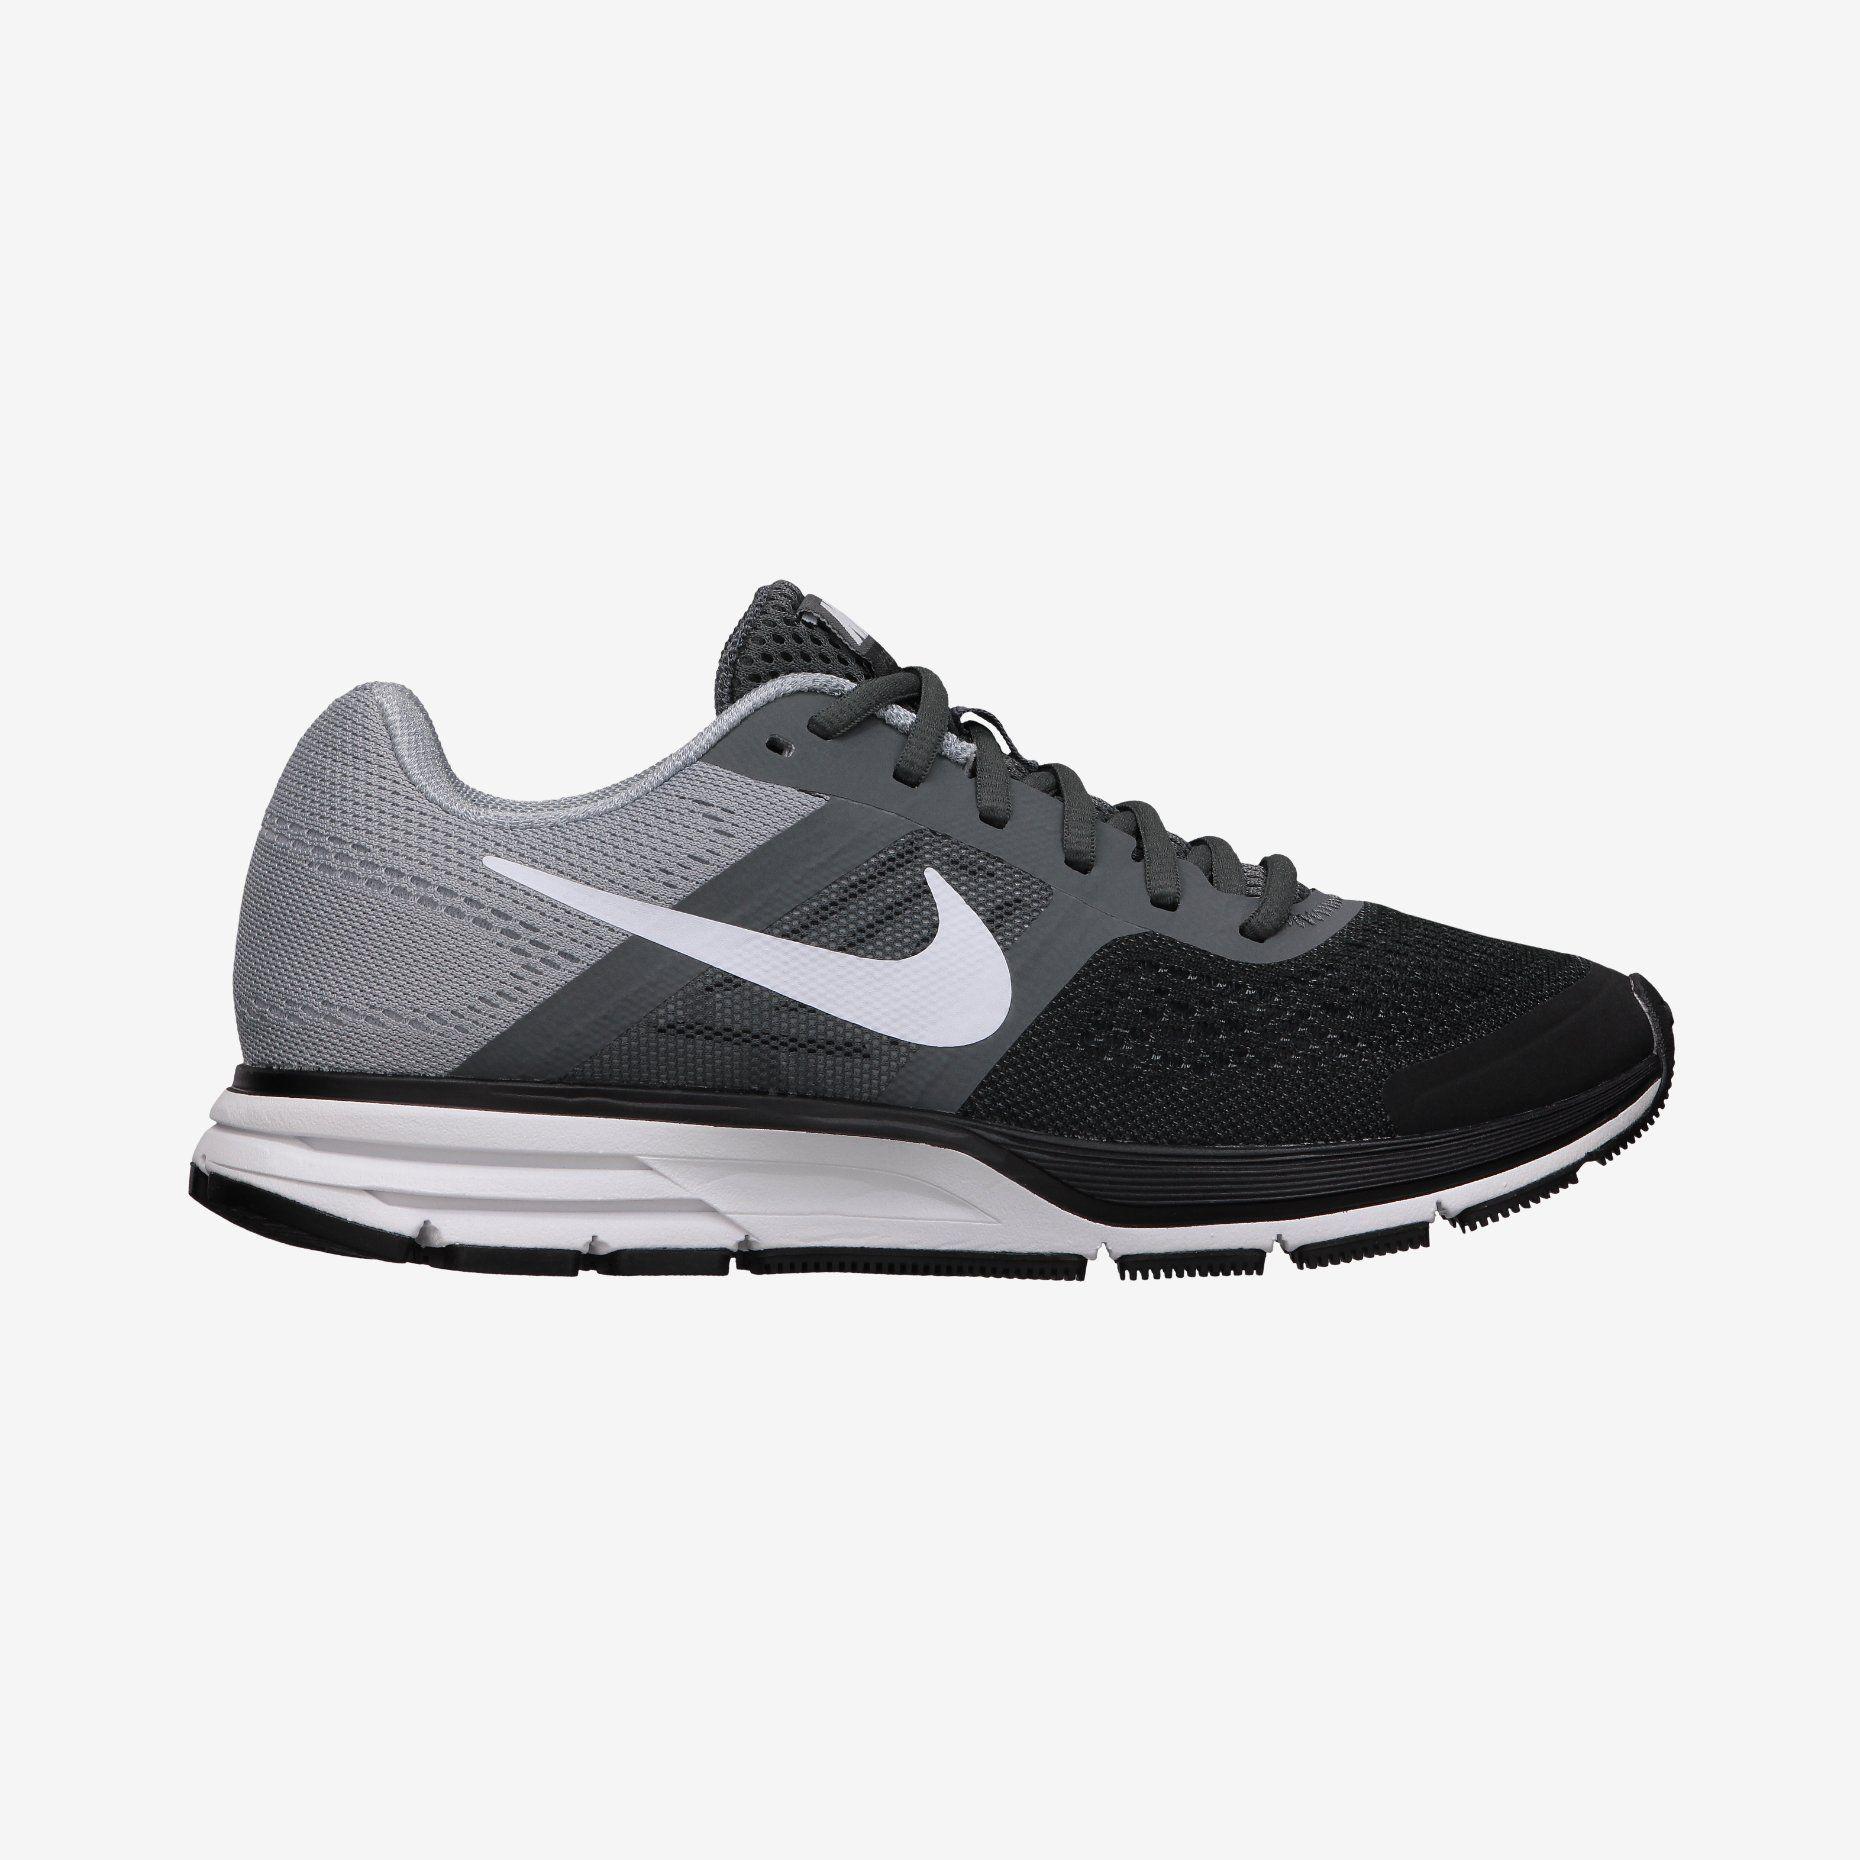 Nike Nike Air Pegasus 30 Femme's Running Shoe Shoe Running fashion 3f7380